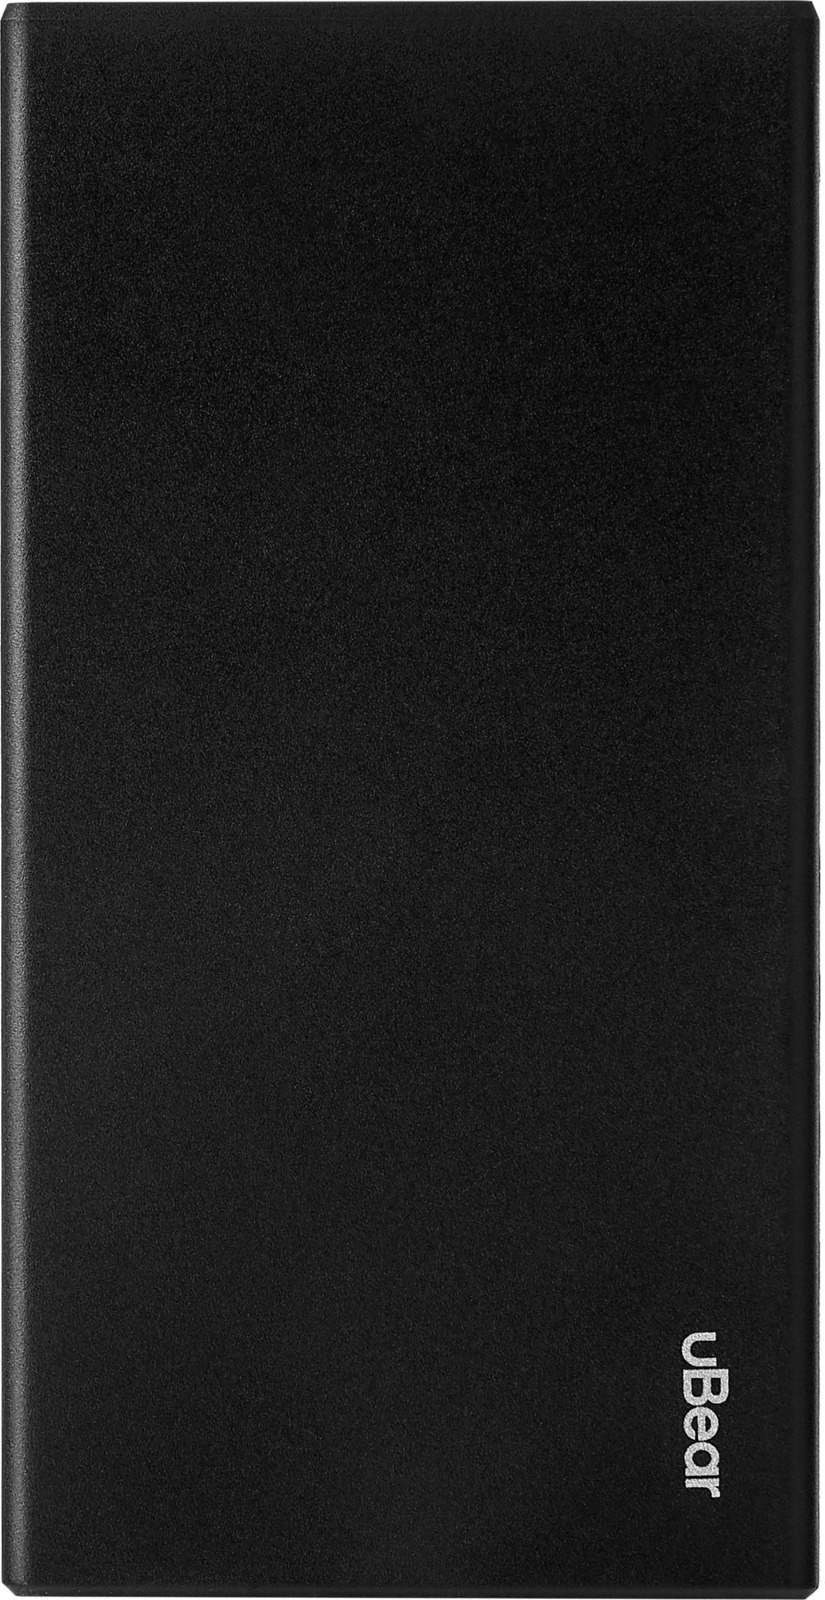 Фото - Внешний аккумулятор uBear Core Power Bank 10000 мАч, черный внешний аккумулятор power bank 10000 мач pineng pn 993pk розовый qc 3 0 type c